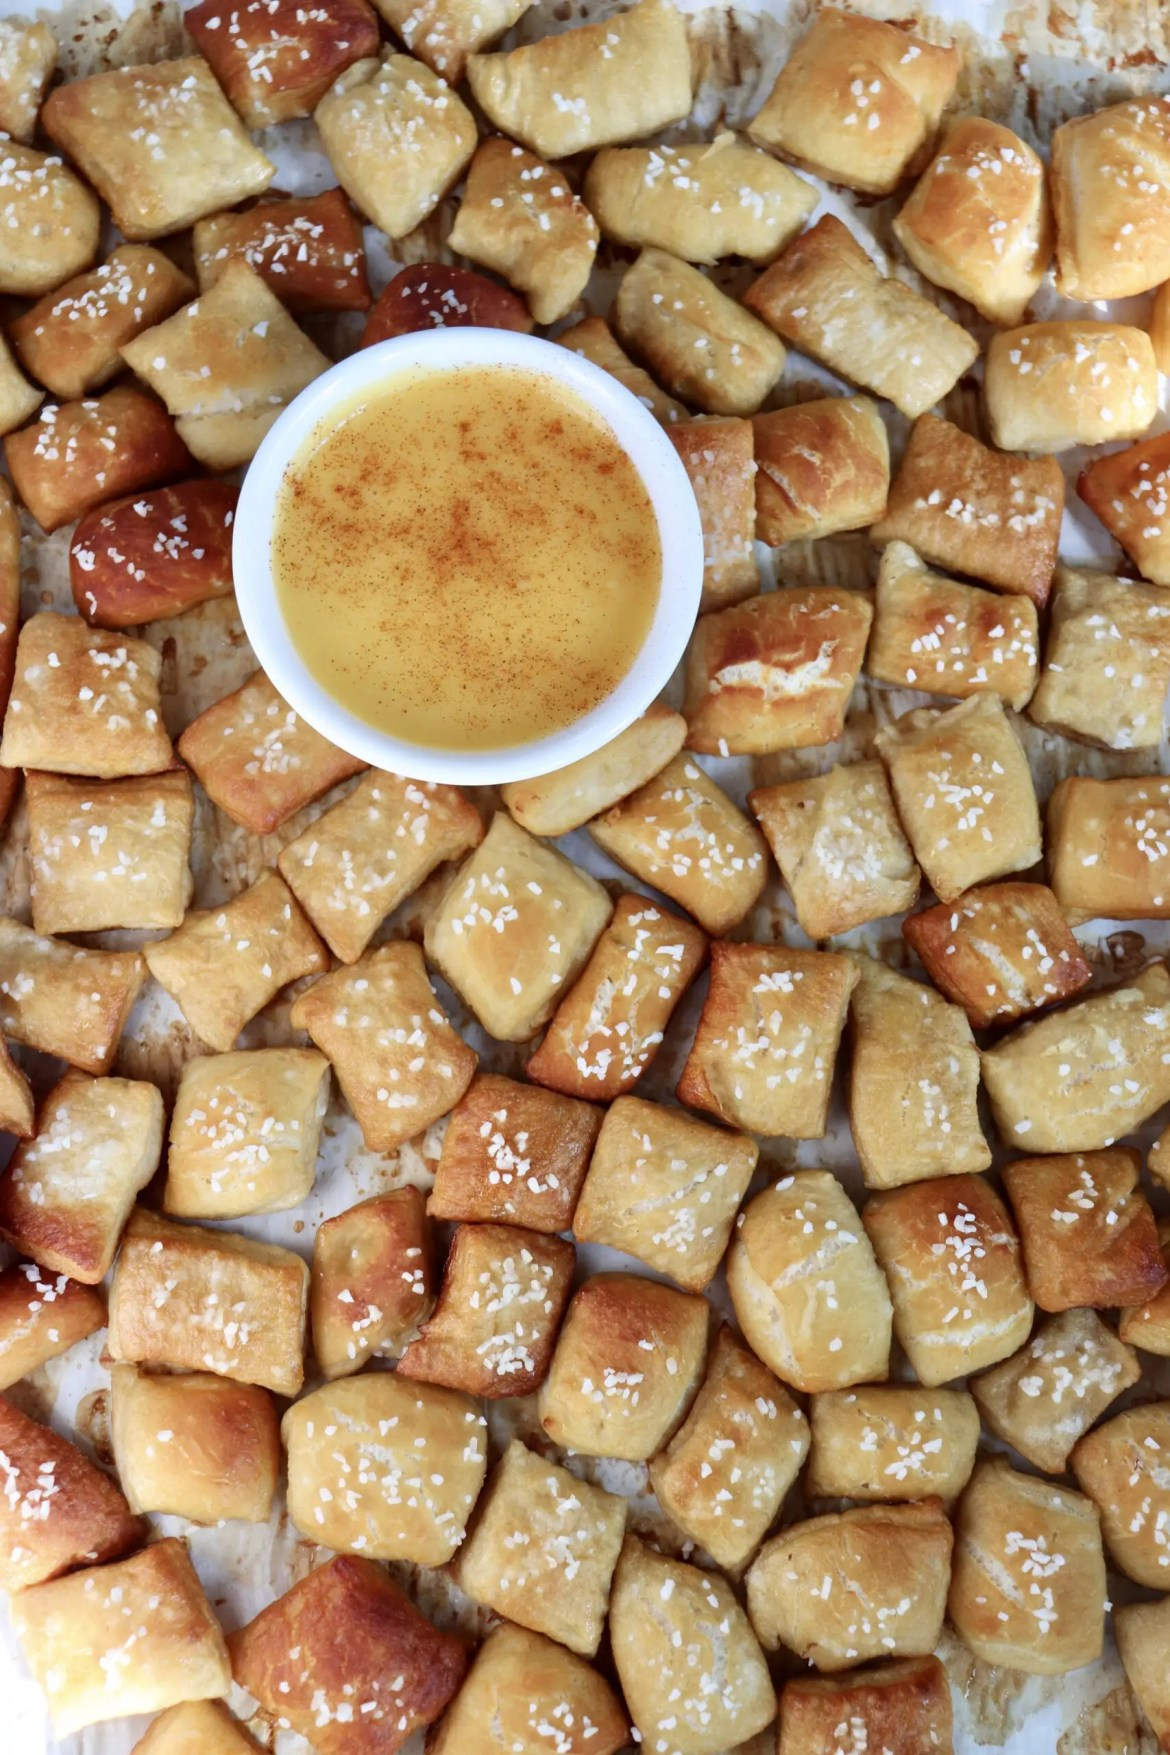 Homemade Soft Pretzel Bites with Vegan Cheese Sauce